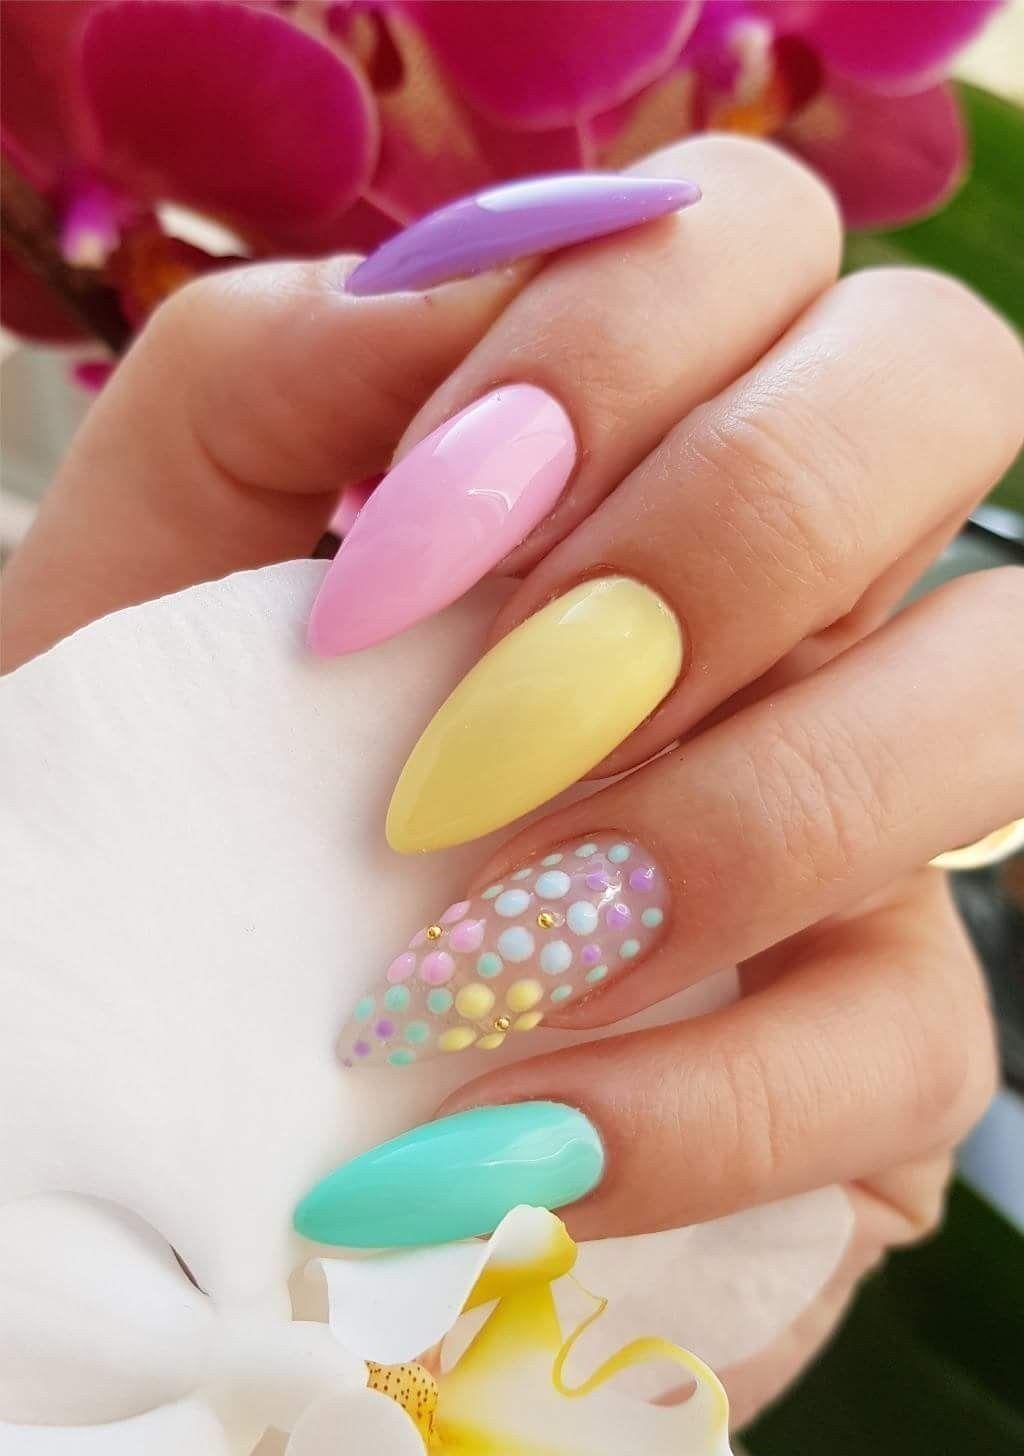 Pin By Jordan Borkovec On Bunnies Baskets Eggs Cute Acrylic Nails Spring Nail Art Classy Nails